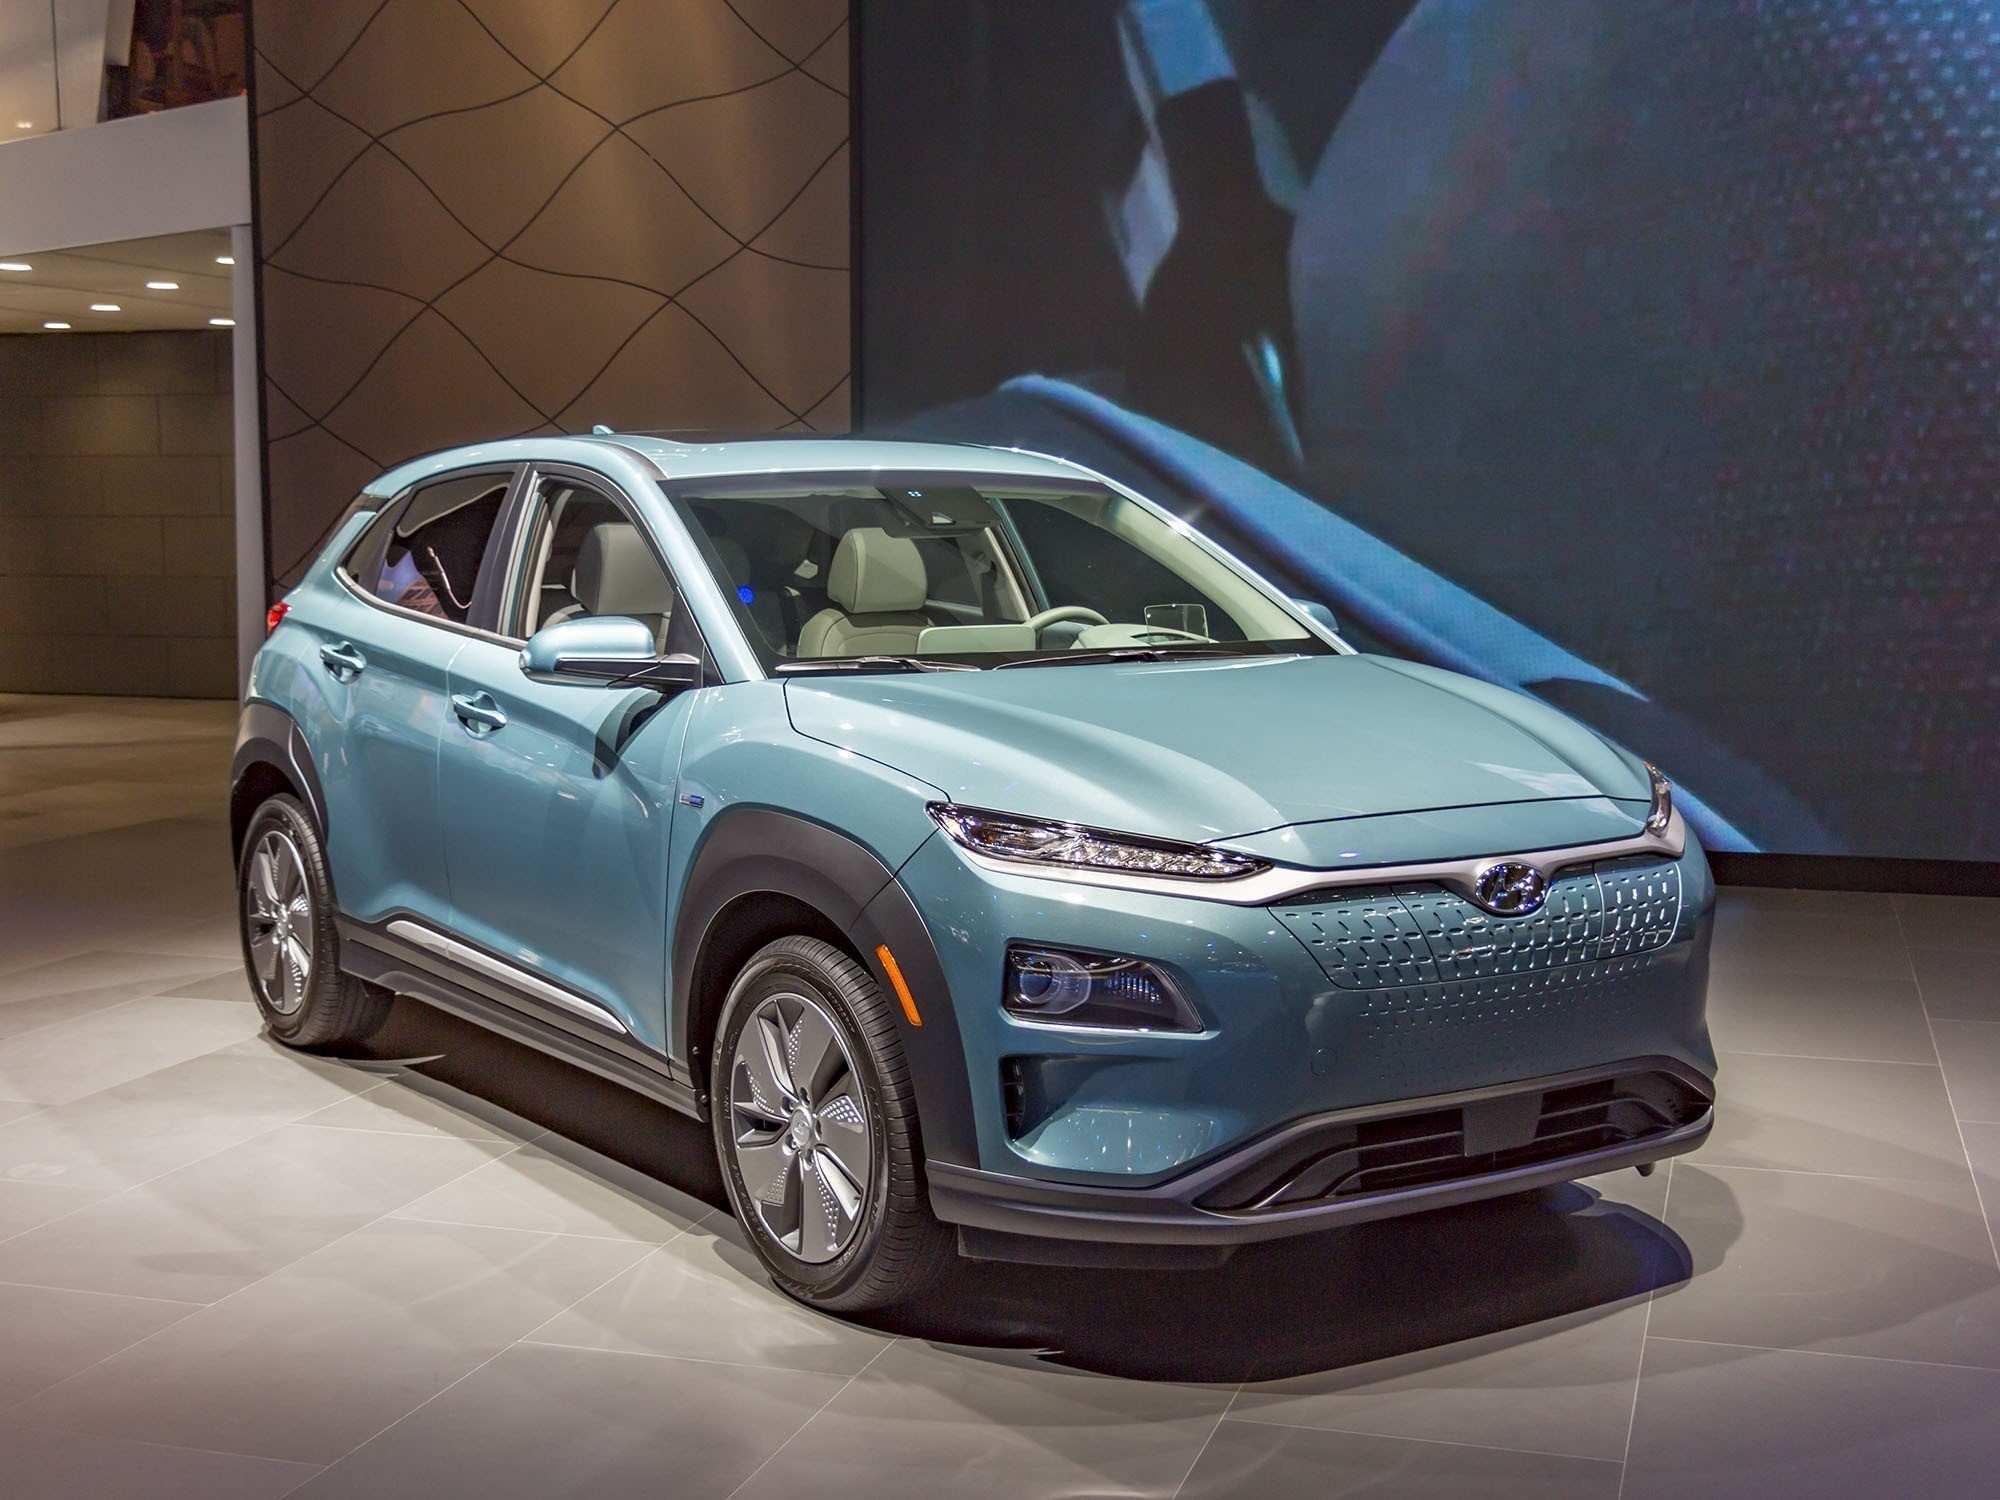 22 Great 2019 Hyundai Warranty Performance with 2019 Hyundai Warranty